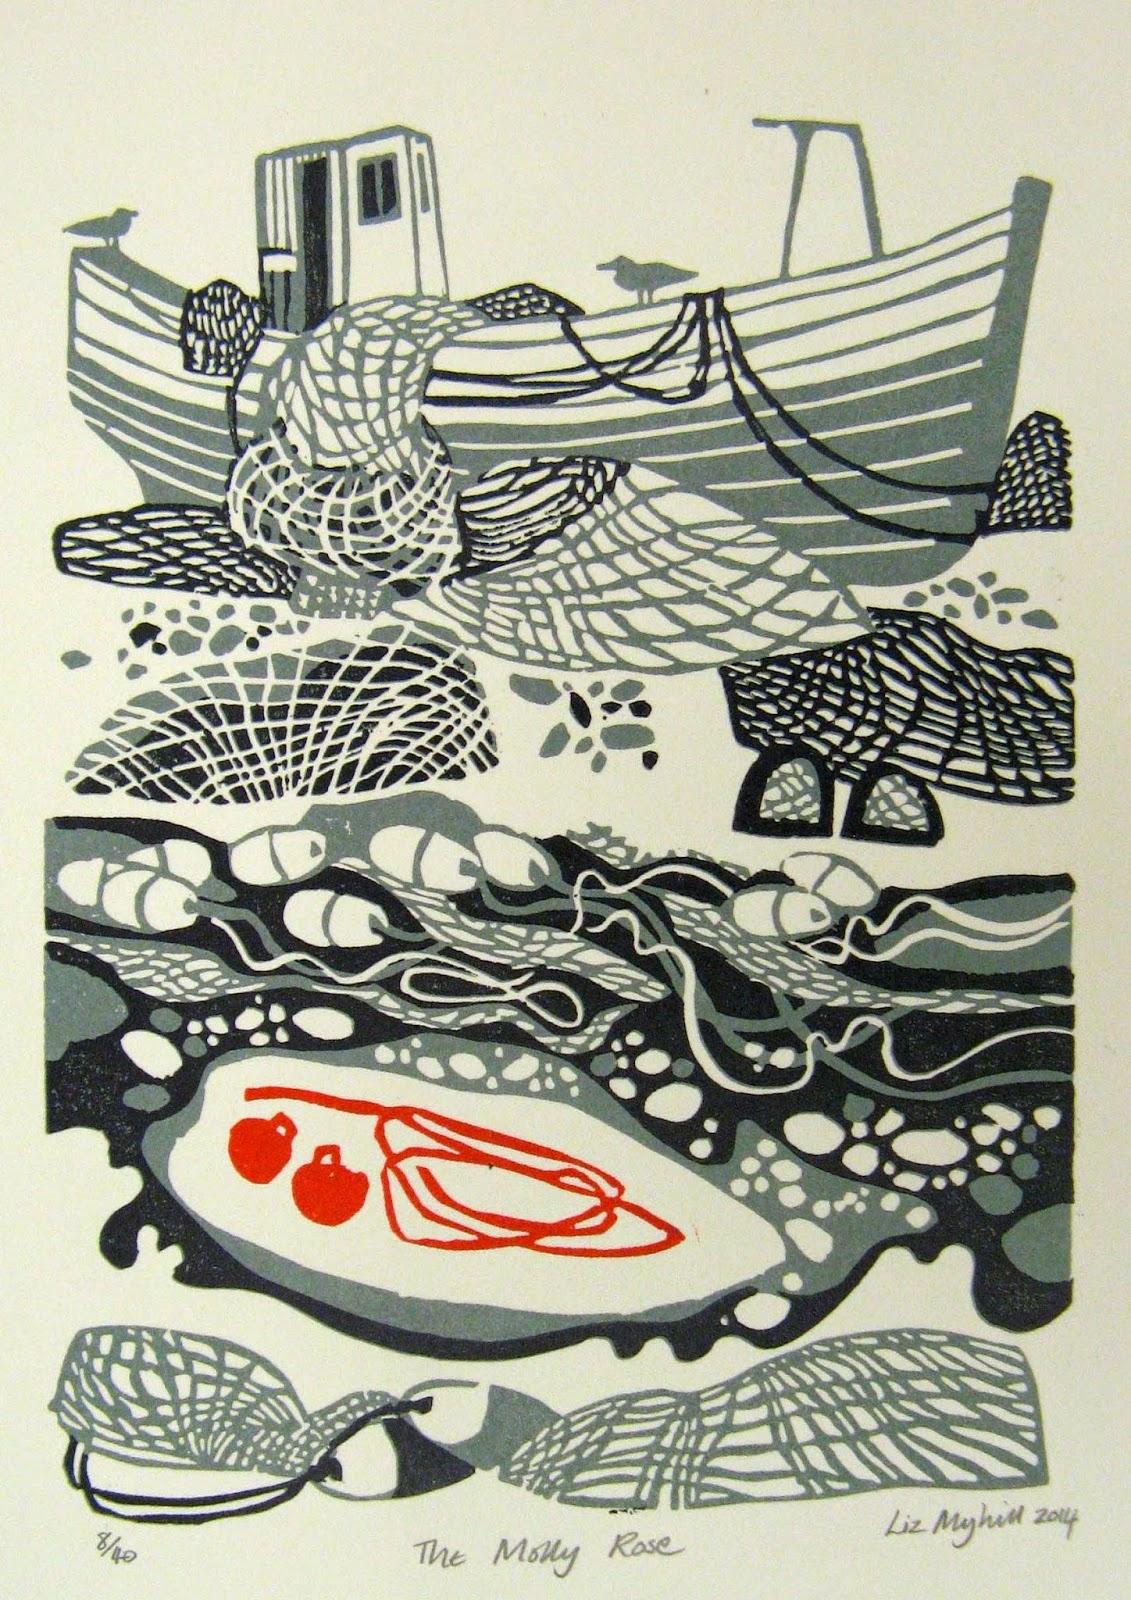 Kitchen Designers Gold Coast Liz Myhill New Linocut Prints